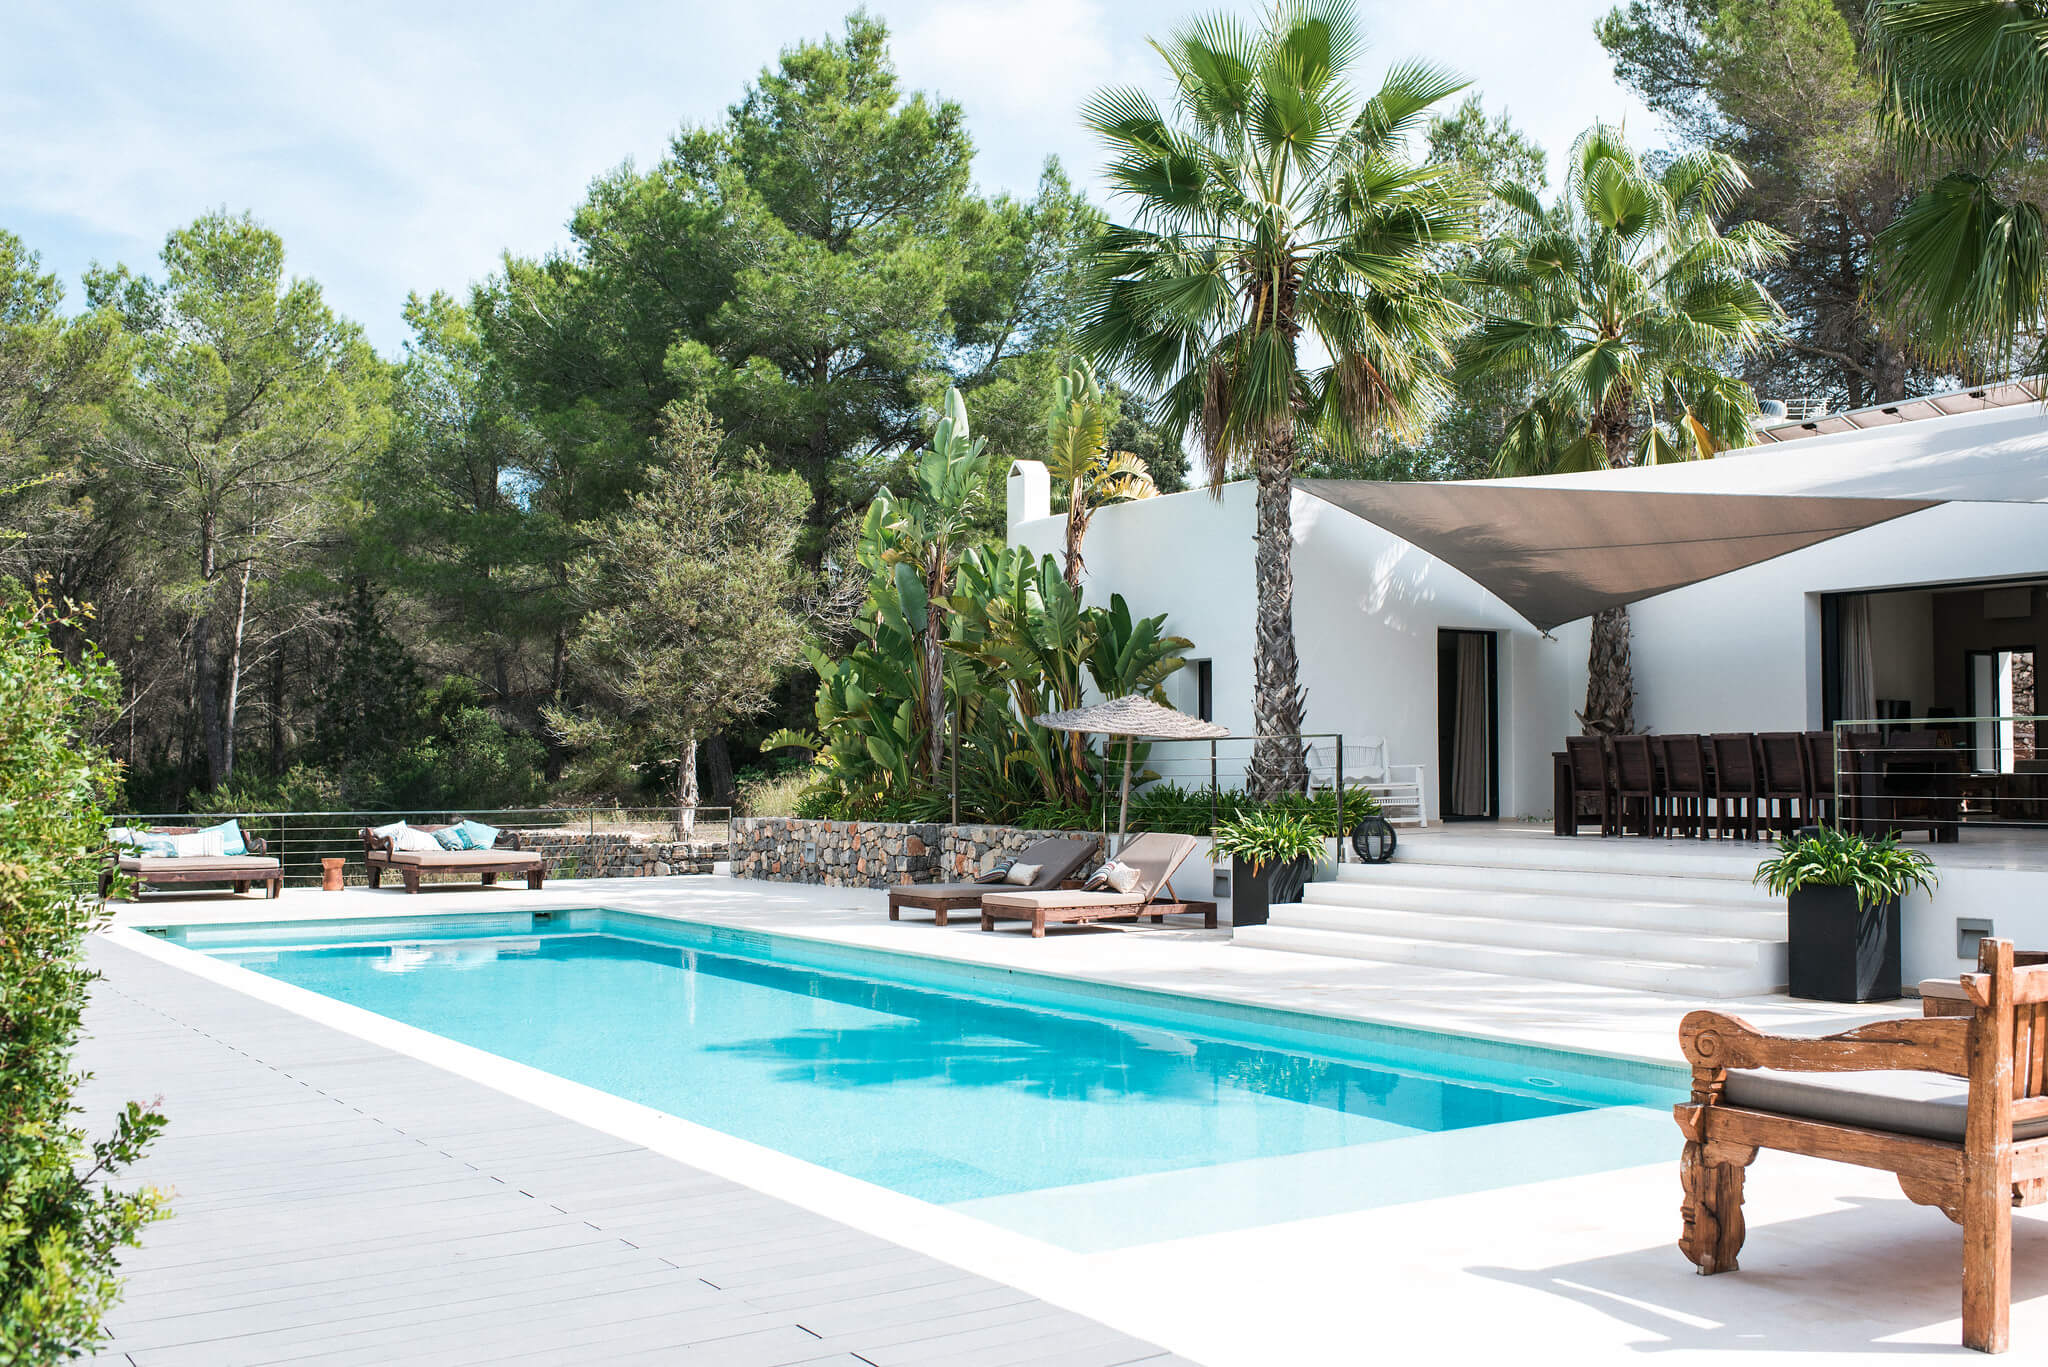 https://www.white-ibiza.com/wp-content/uploads/2020/05/white-ibiza-villas-casa-estrella-exterior-pool-corner.jpg